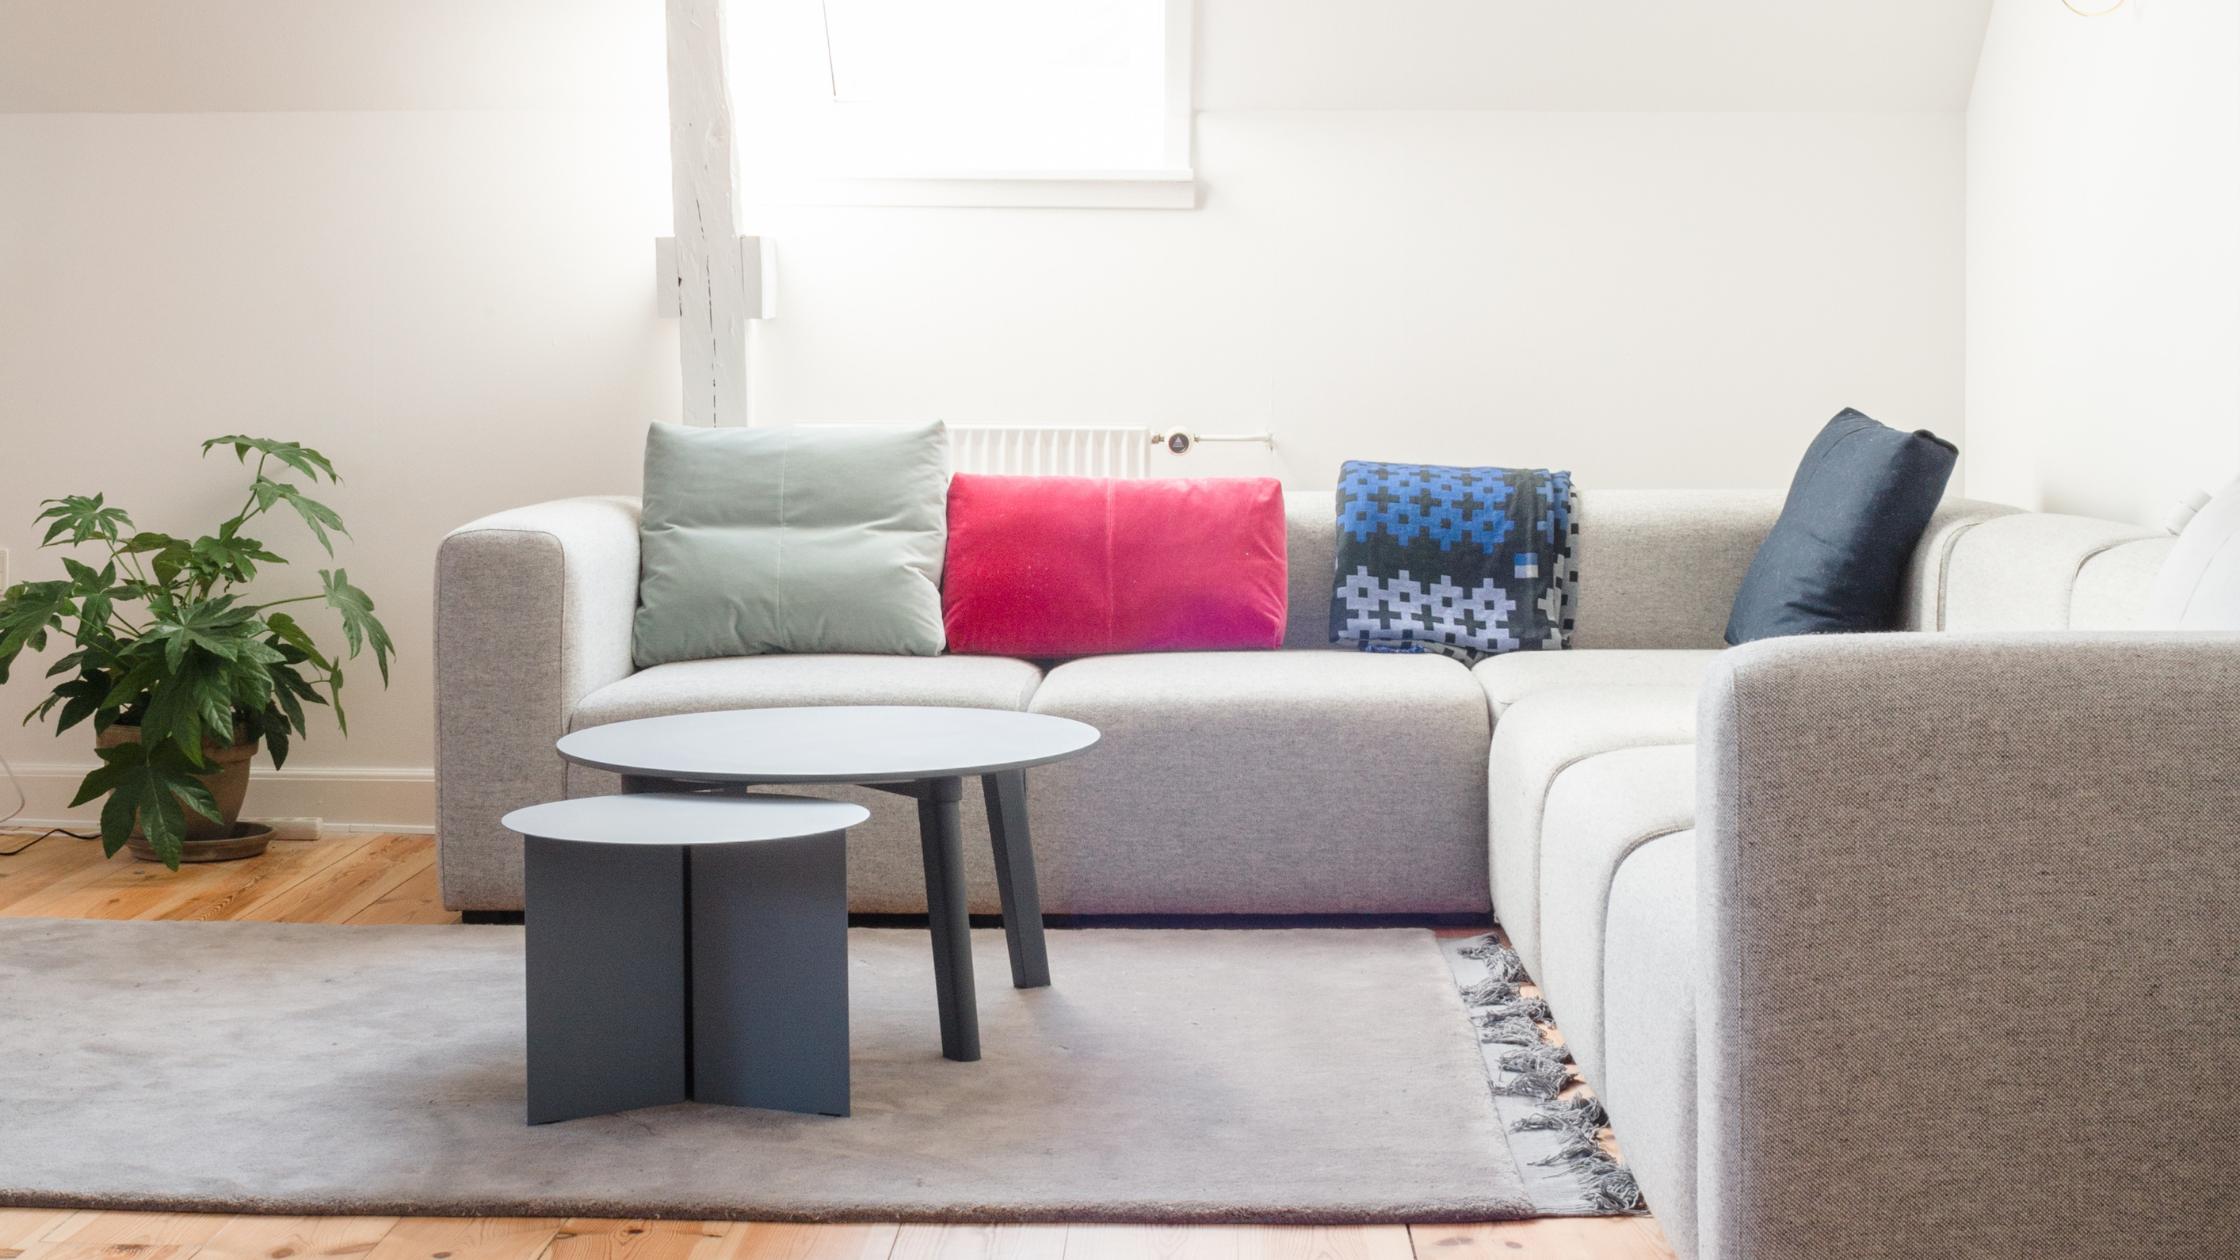 LifeX home living room